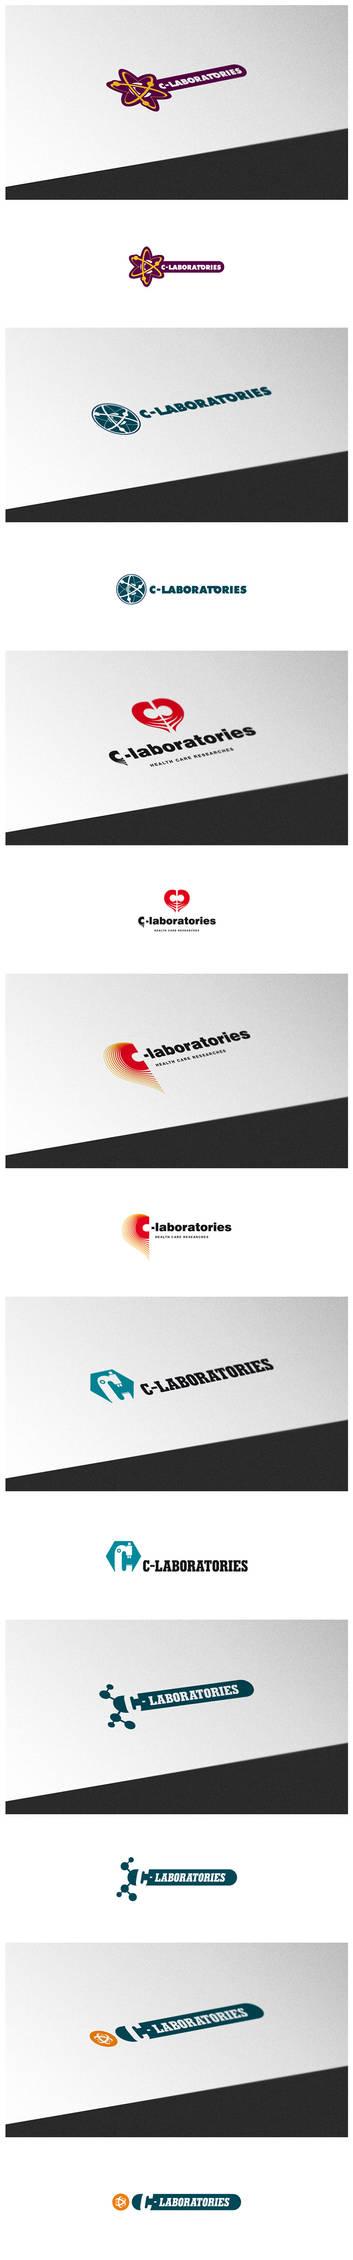 C-laboratories Logo